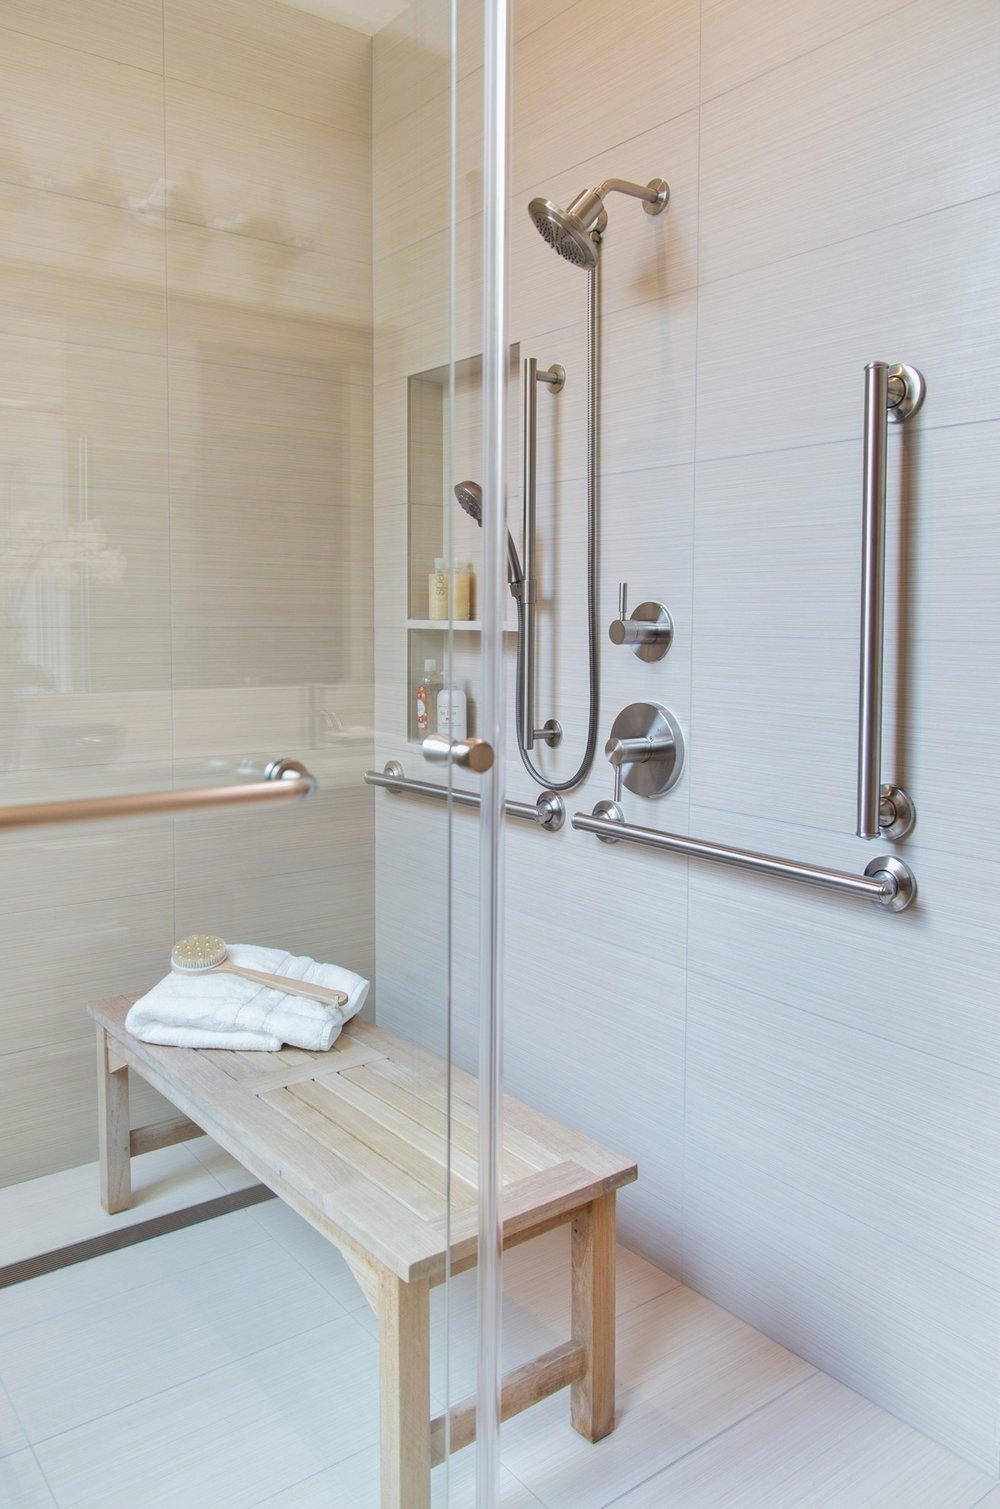 Looking Bathroom Grab Bars For, Handicap Bars For Bathroom